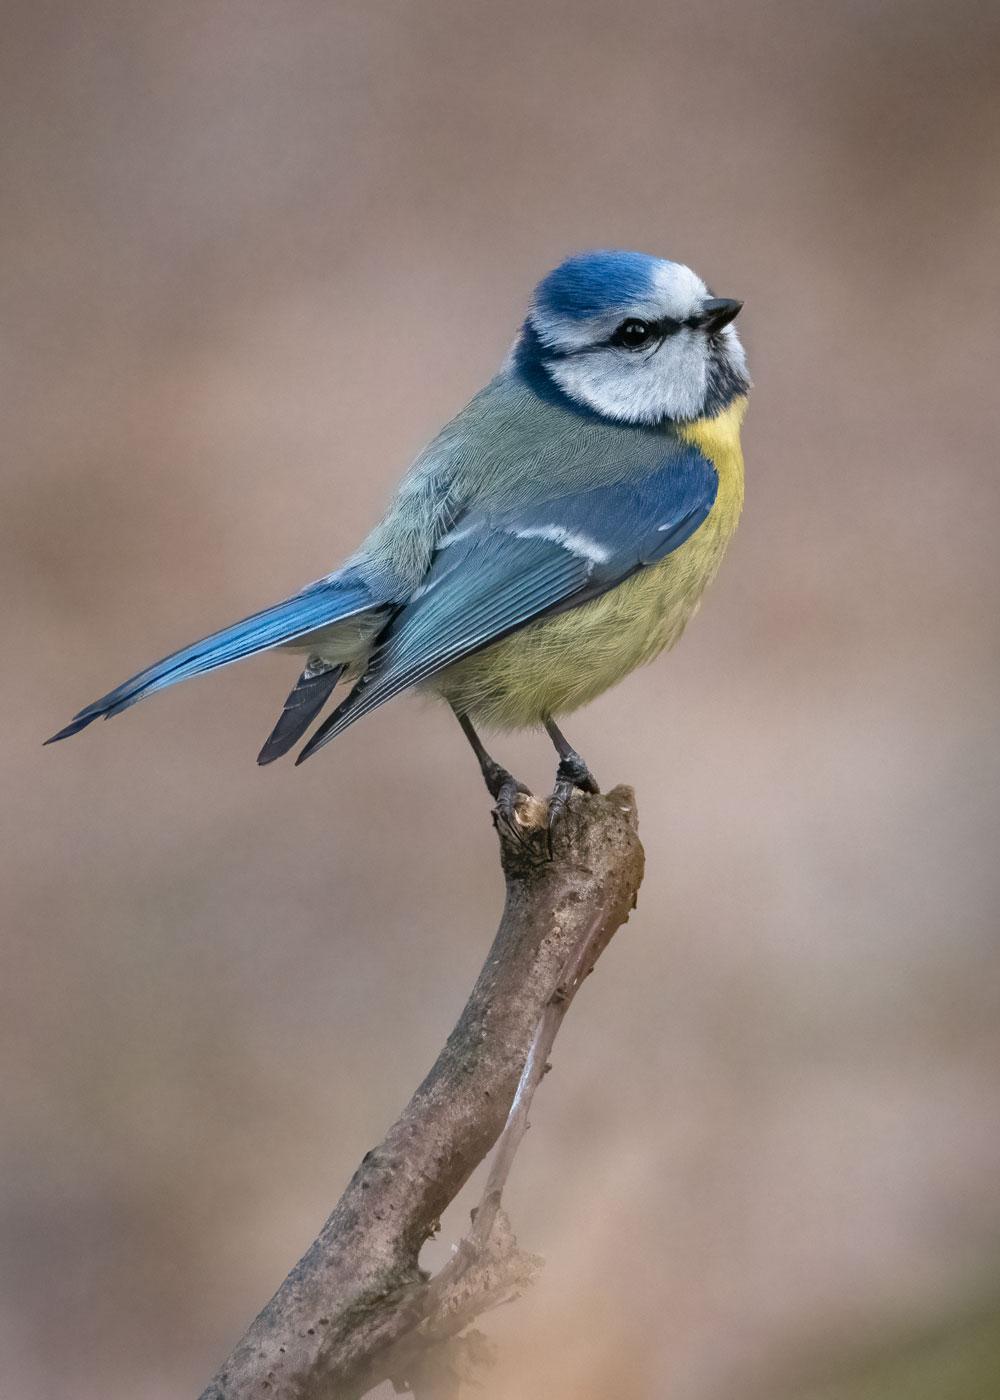 Pitigoi albastru-Parus caeruleus